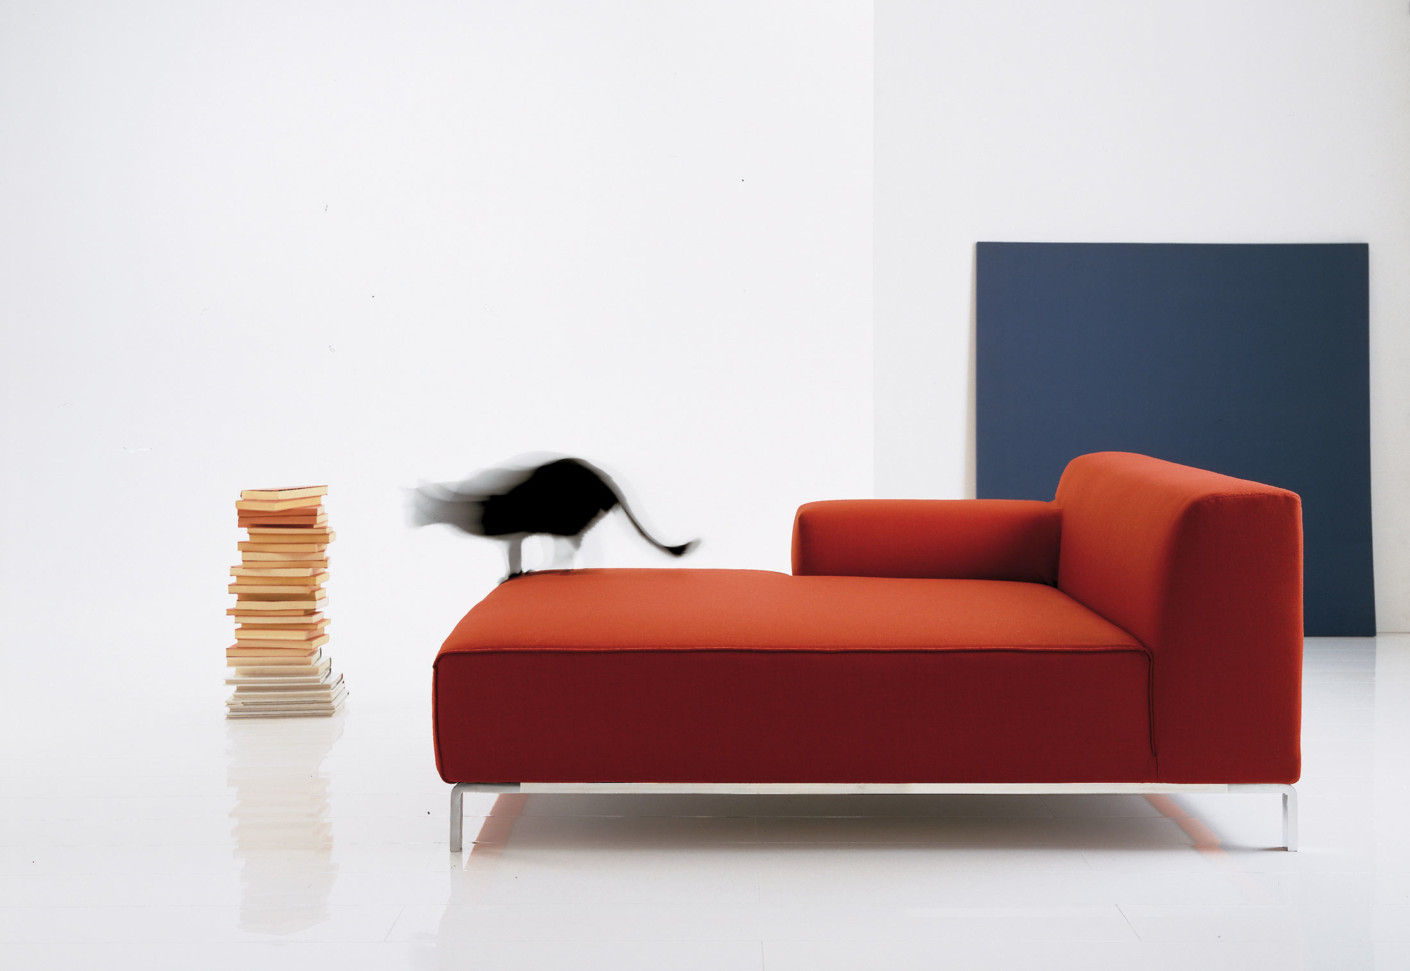 1323 GREG sofa by Zanotta STYLEPARK : 1323 greg sofa 8 from www.stylepark.com size 1410 x 971 jpeg 114kB